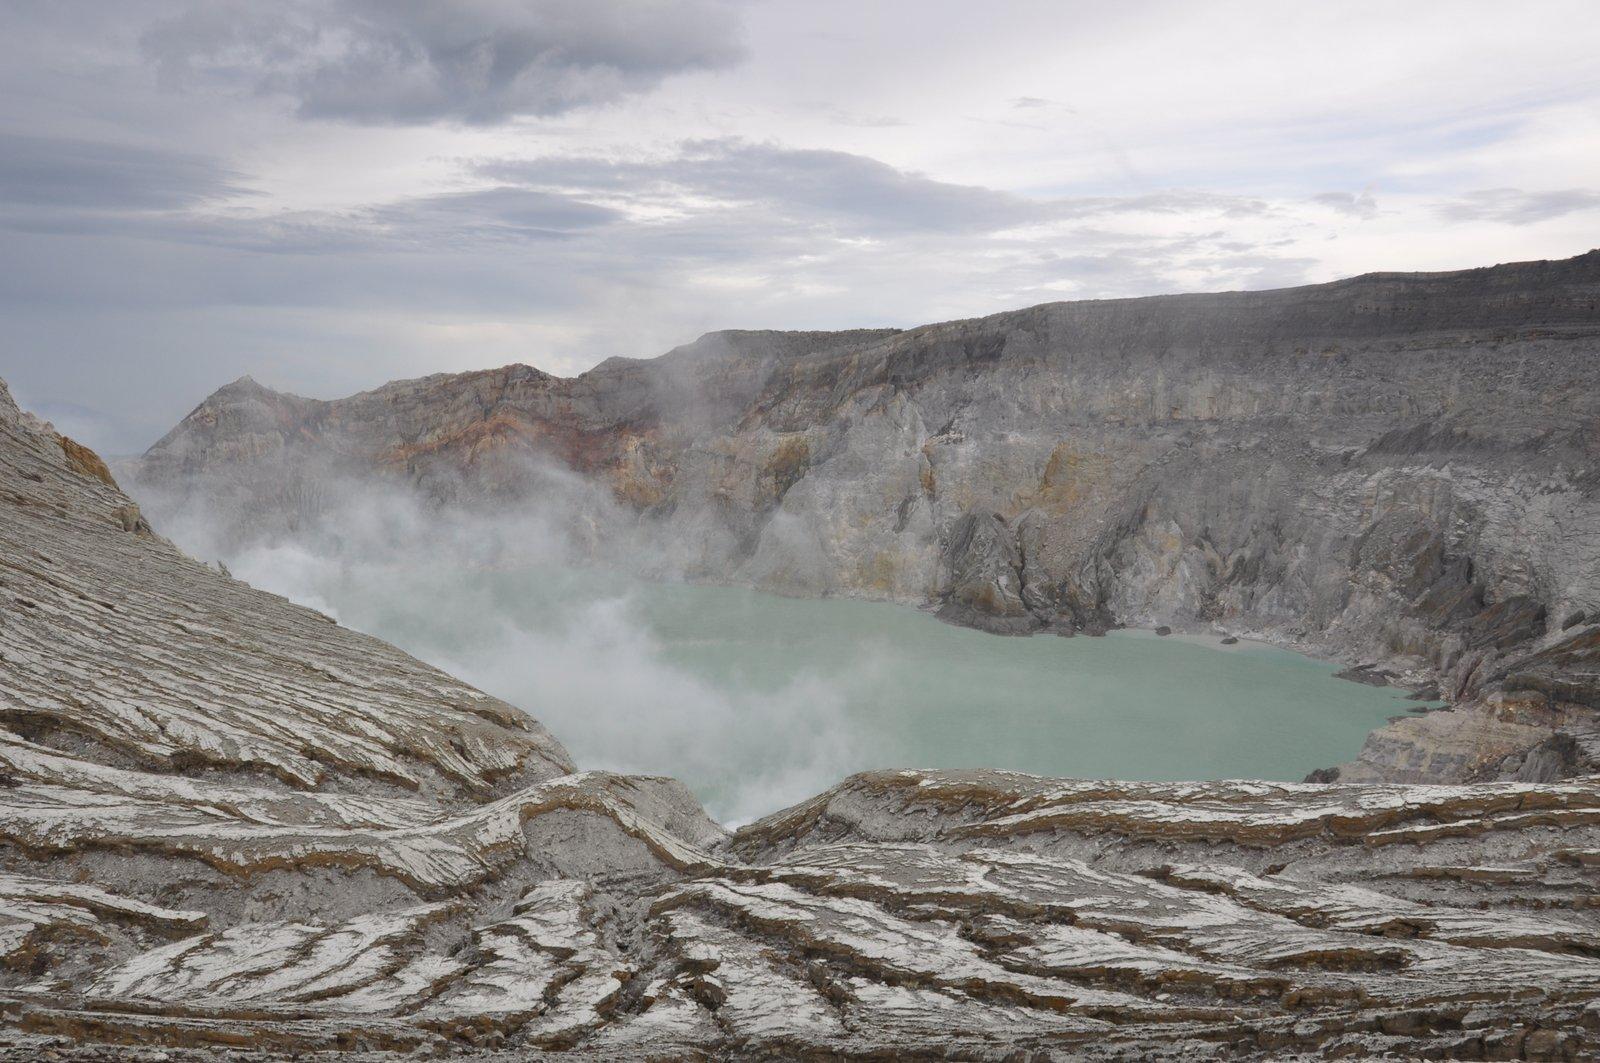 kawah-ijen-volcán-Indonesia